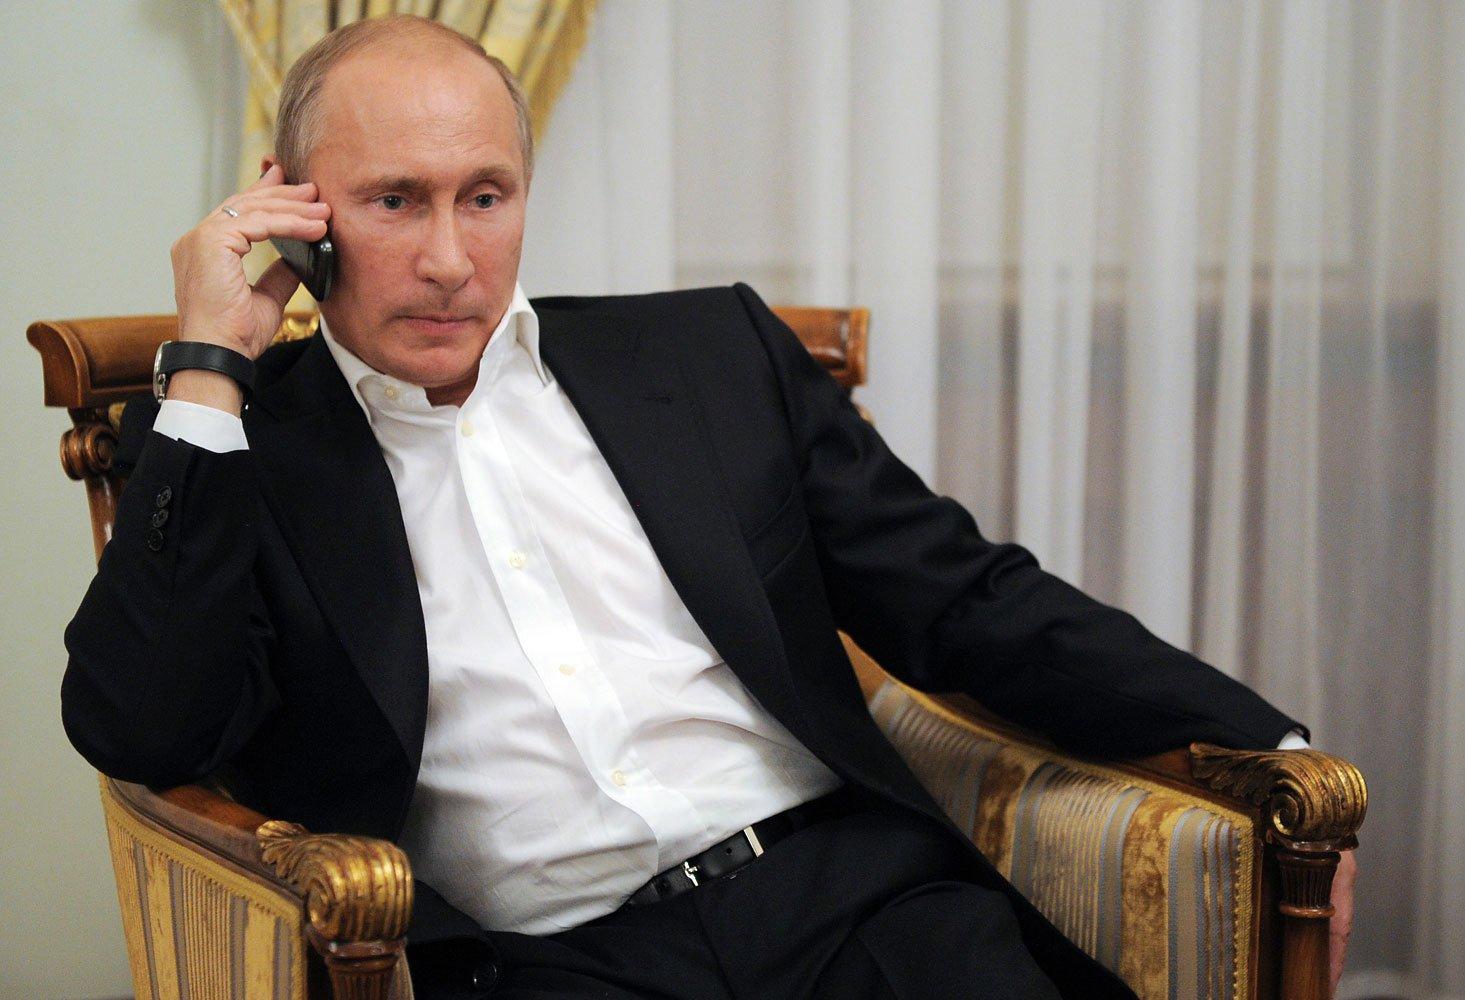 Poutine avoue ne pas avoir de smartphone